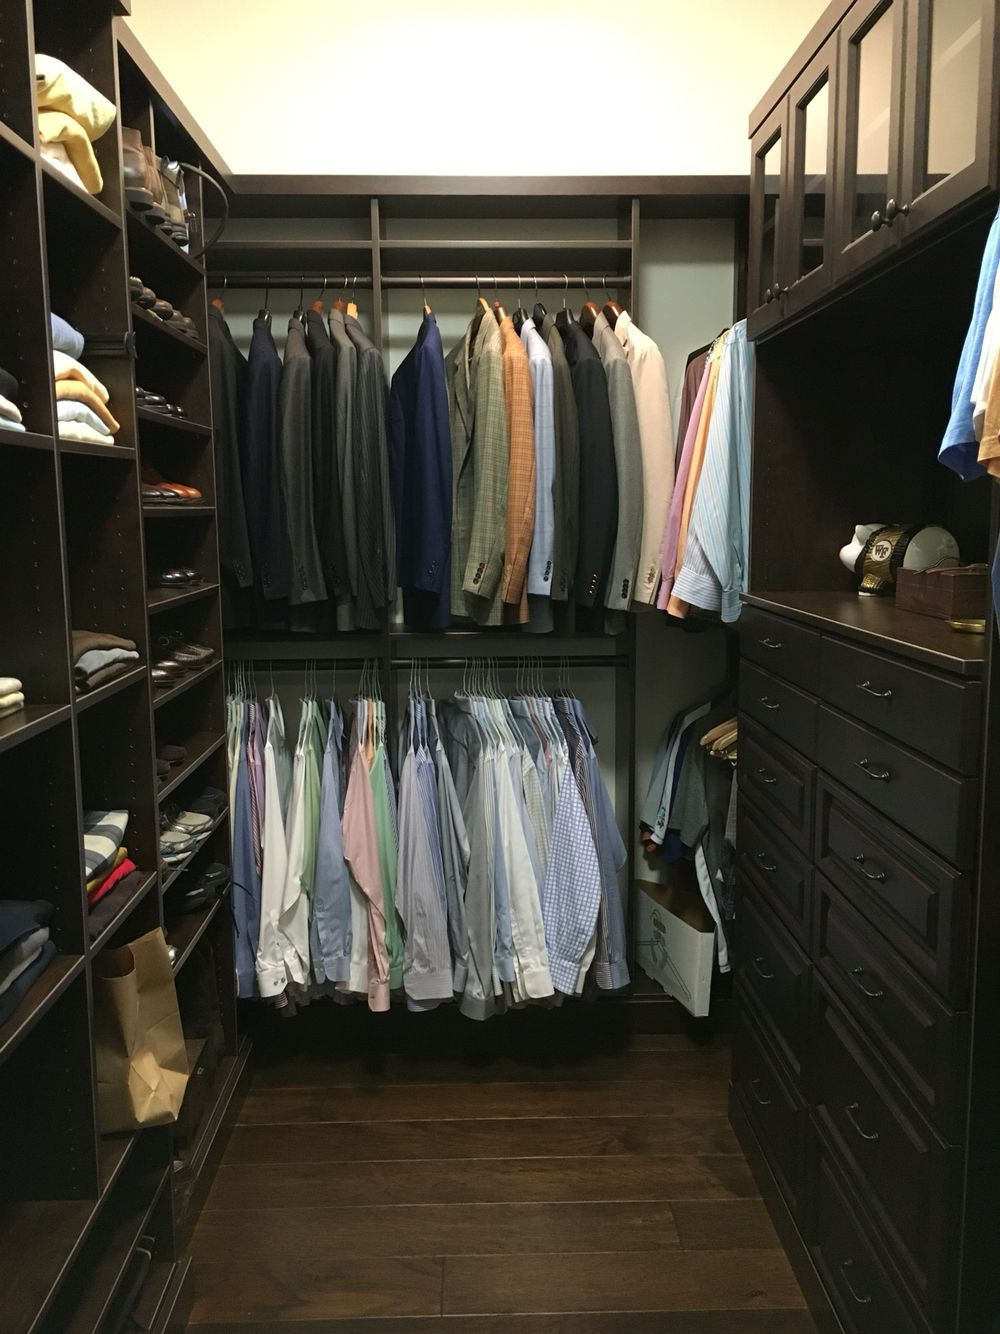 Beau Closet Creations Built This Custom Closet! Organizing Your